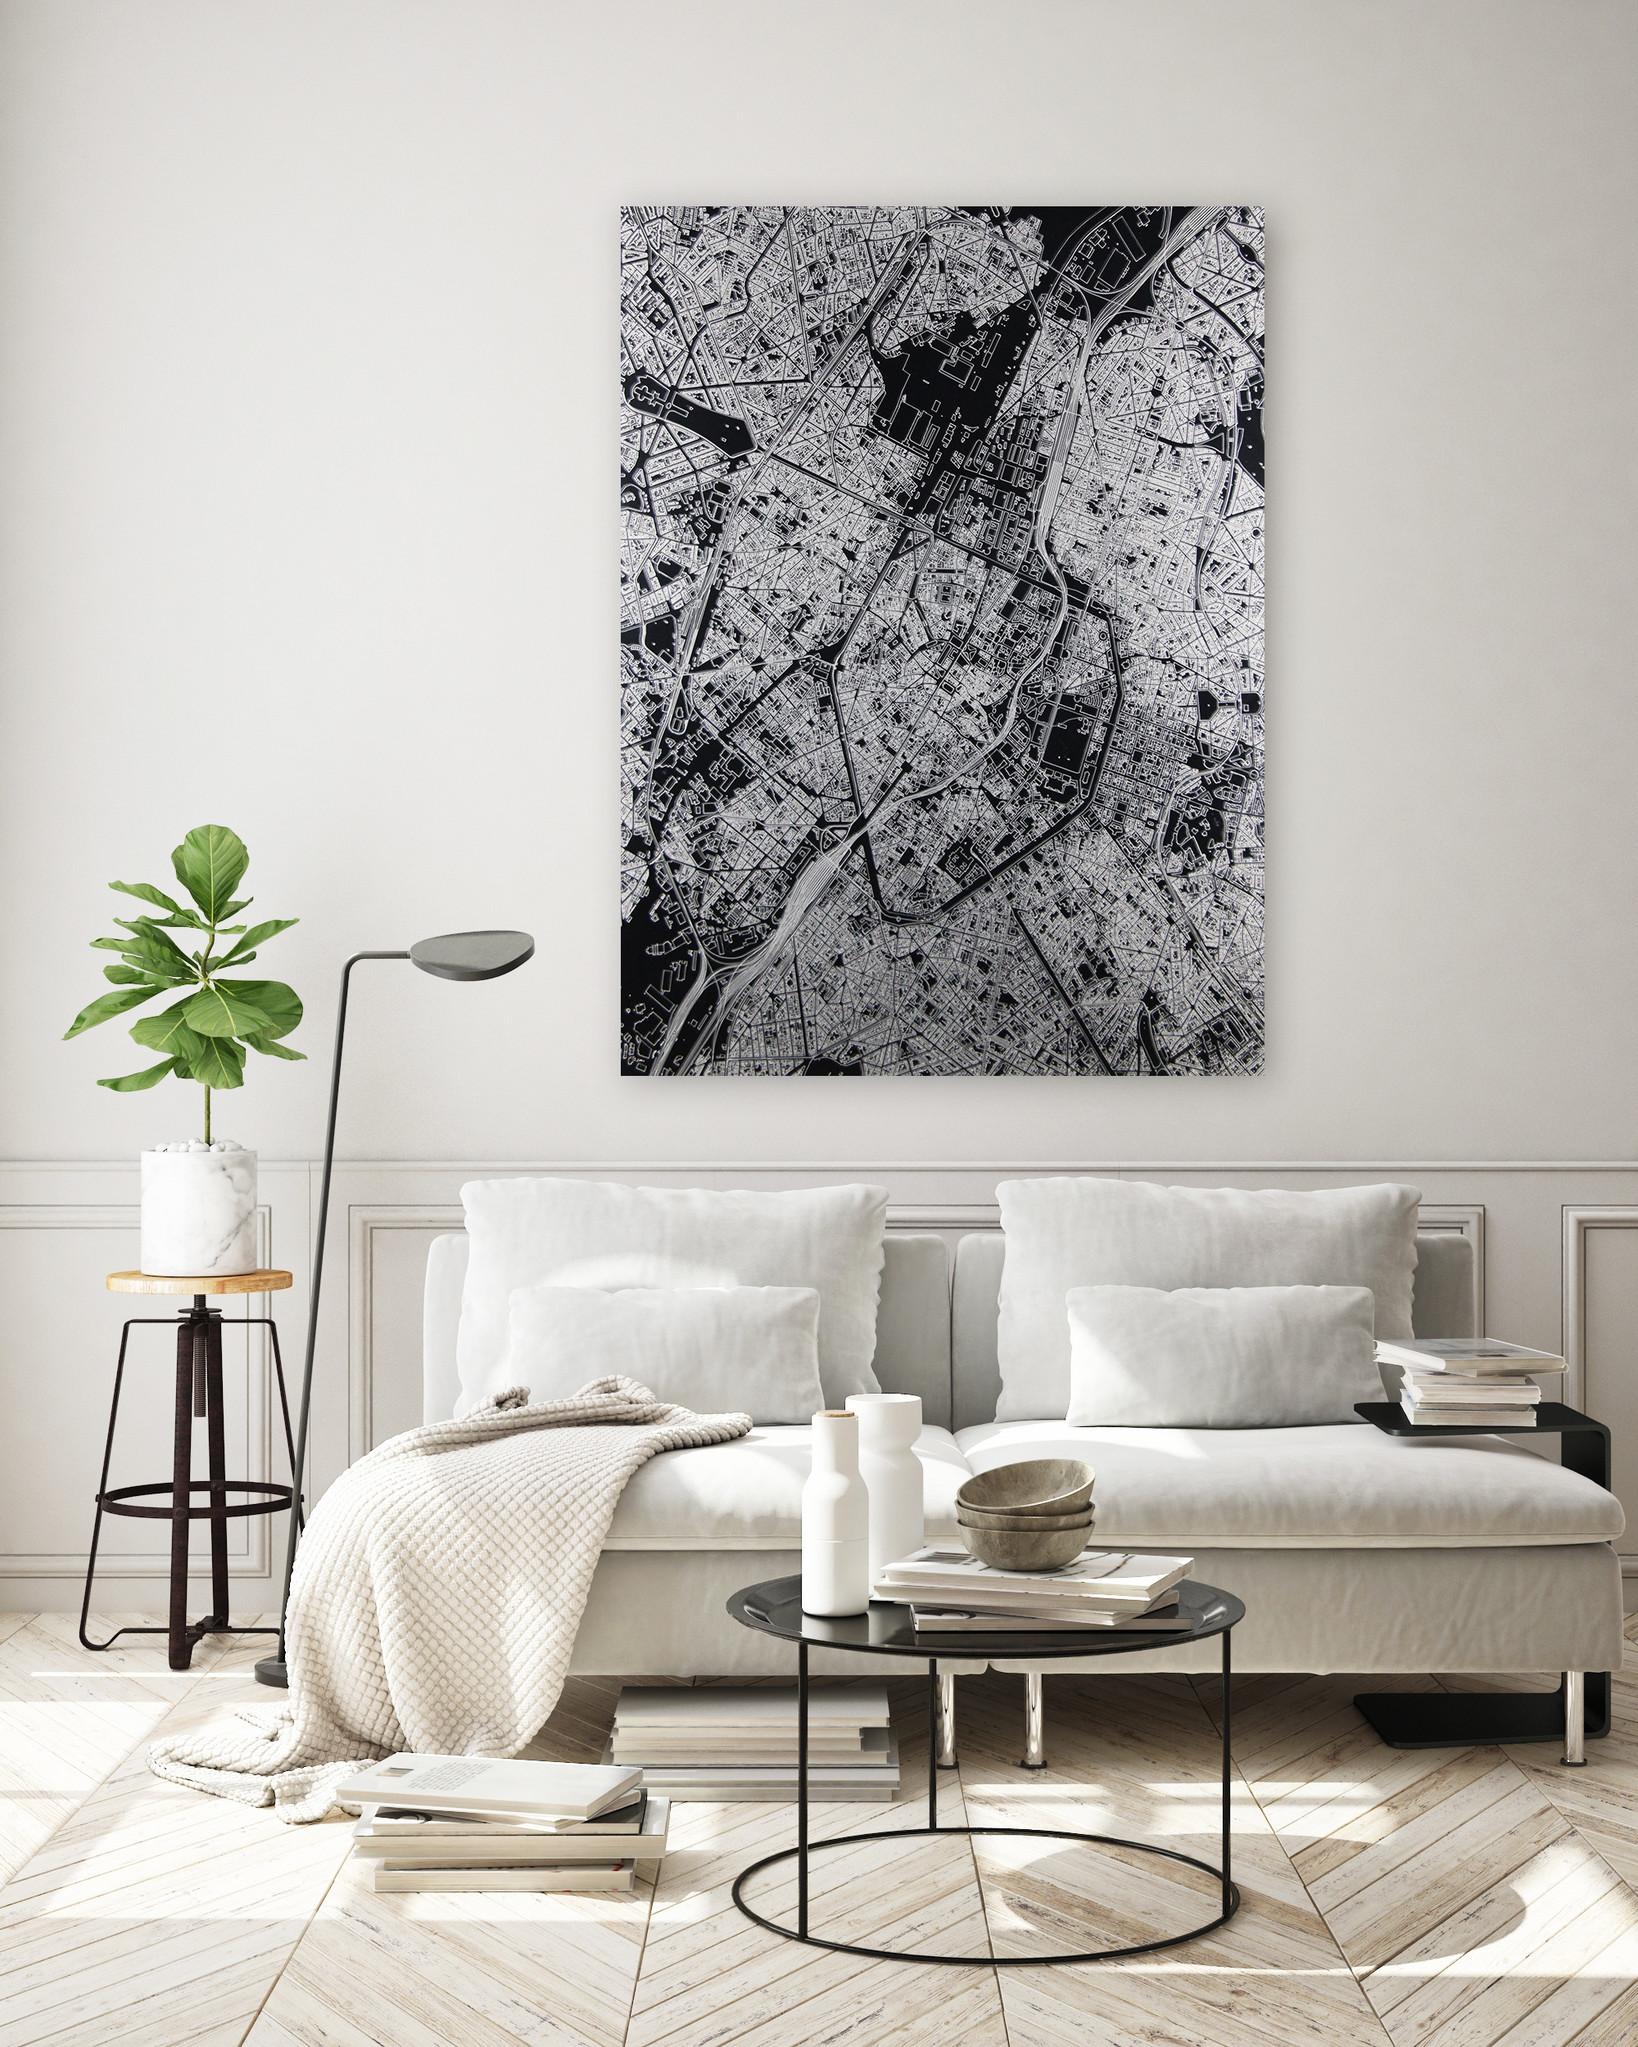 Stadtkarte Porto | Aluminium Wanddekoration-2